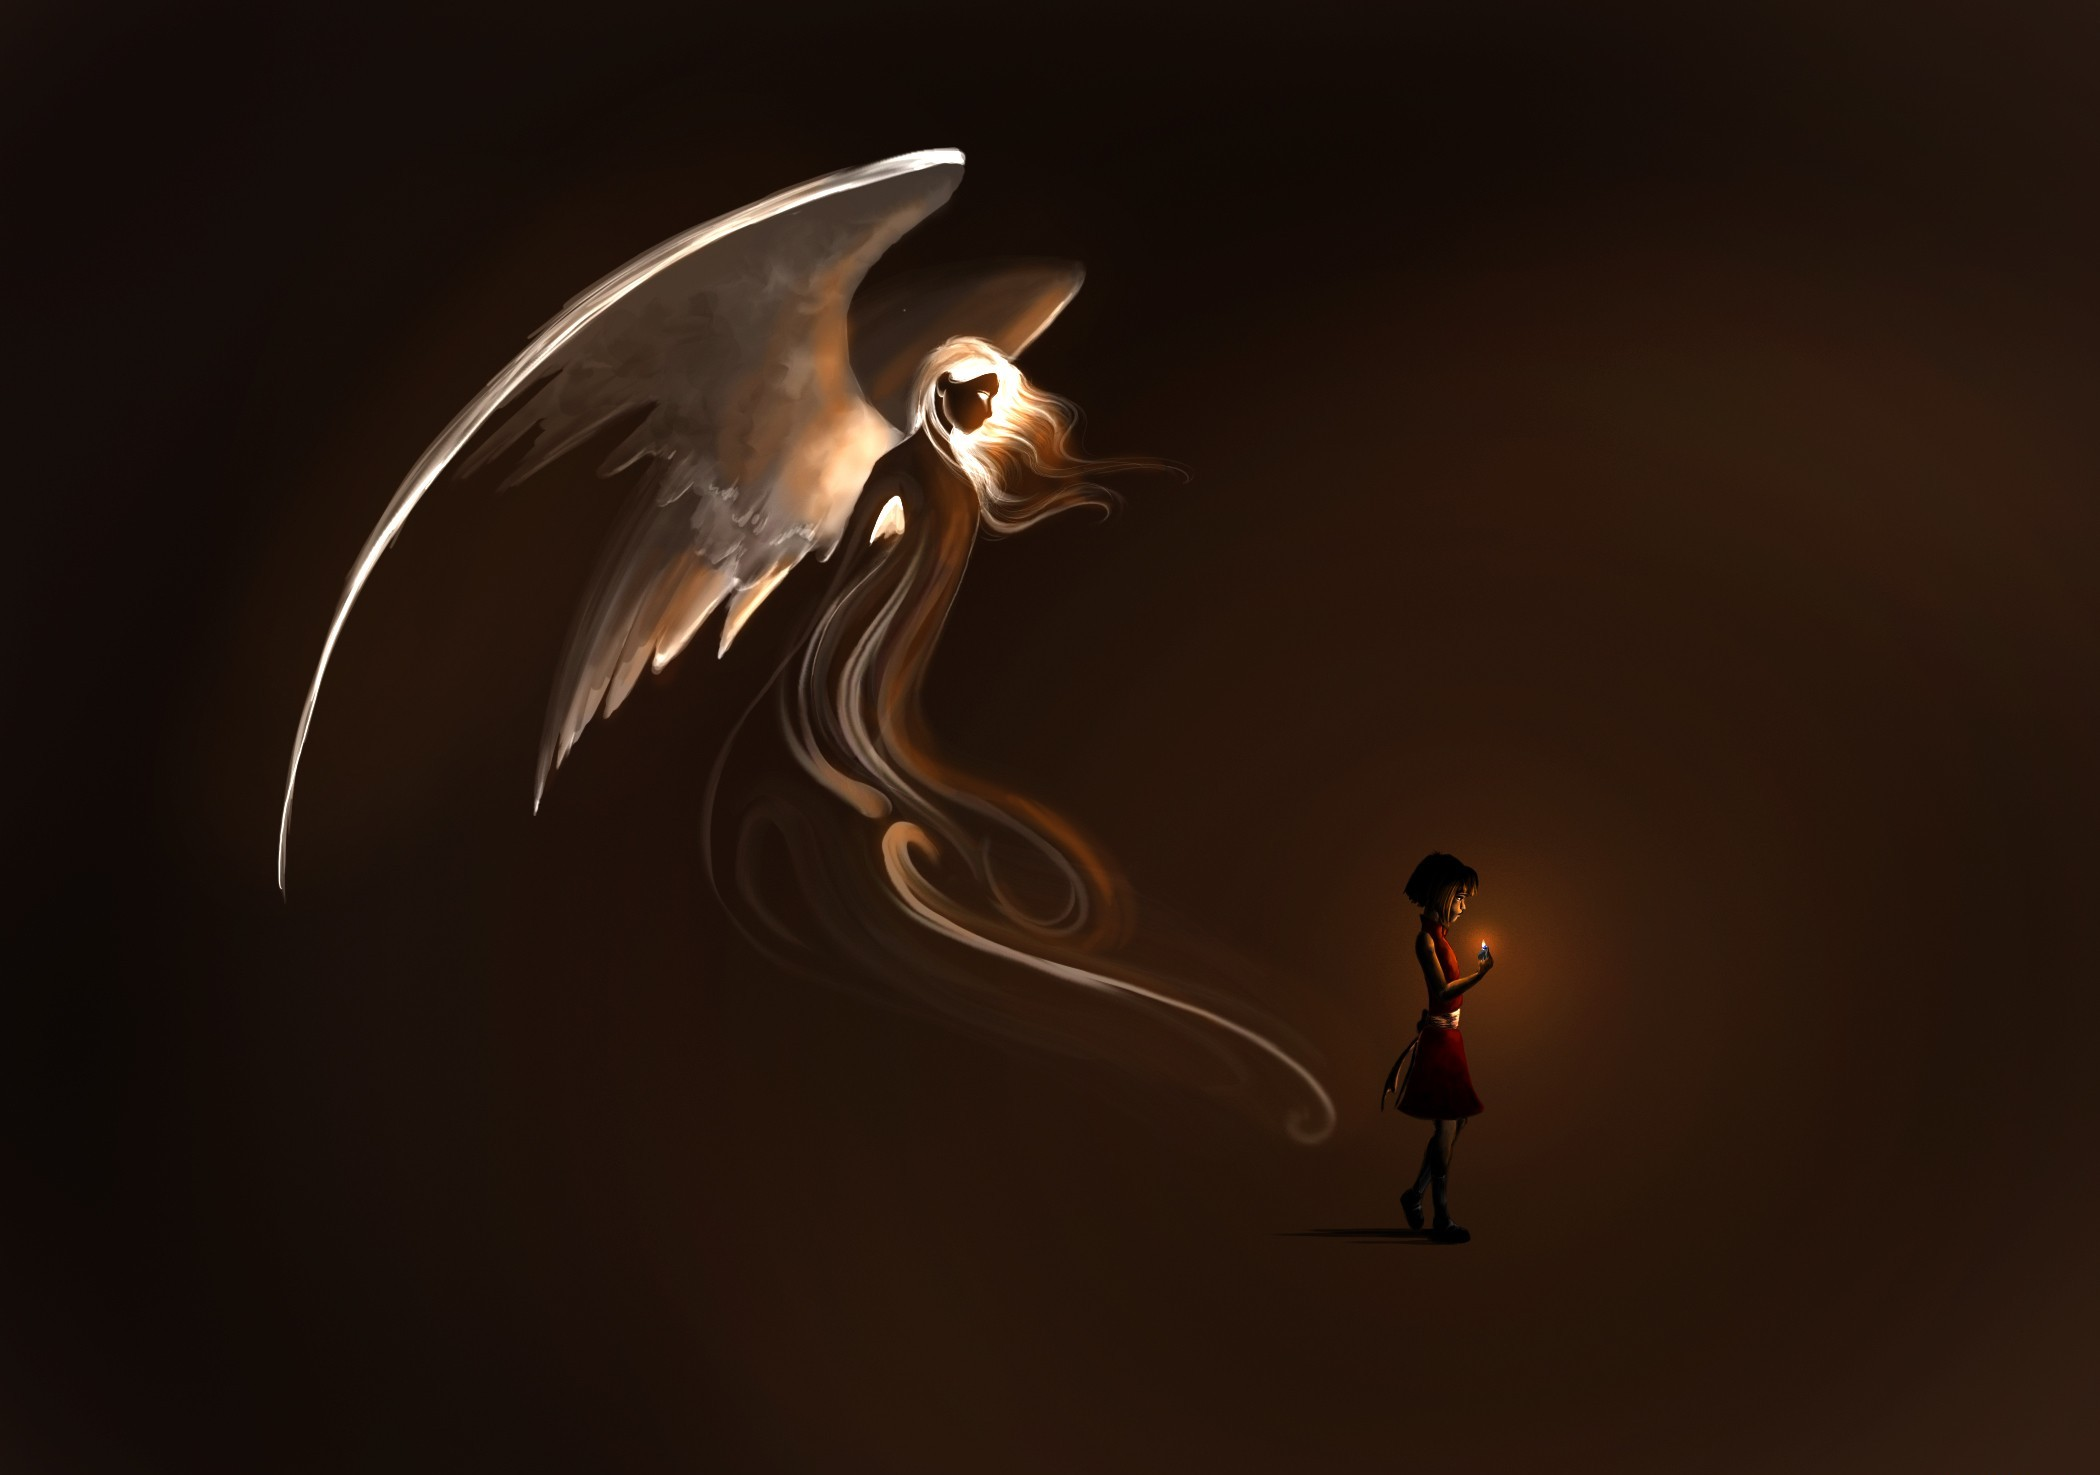 Black Angel Wallpaper - Angel Child Fantasy Art - HD Wallpaper